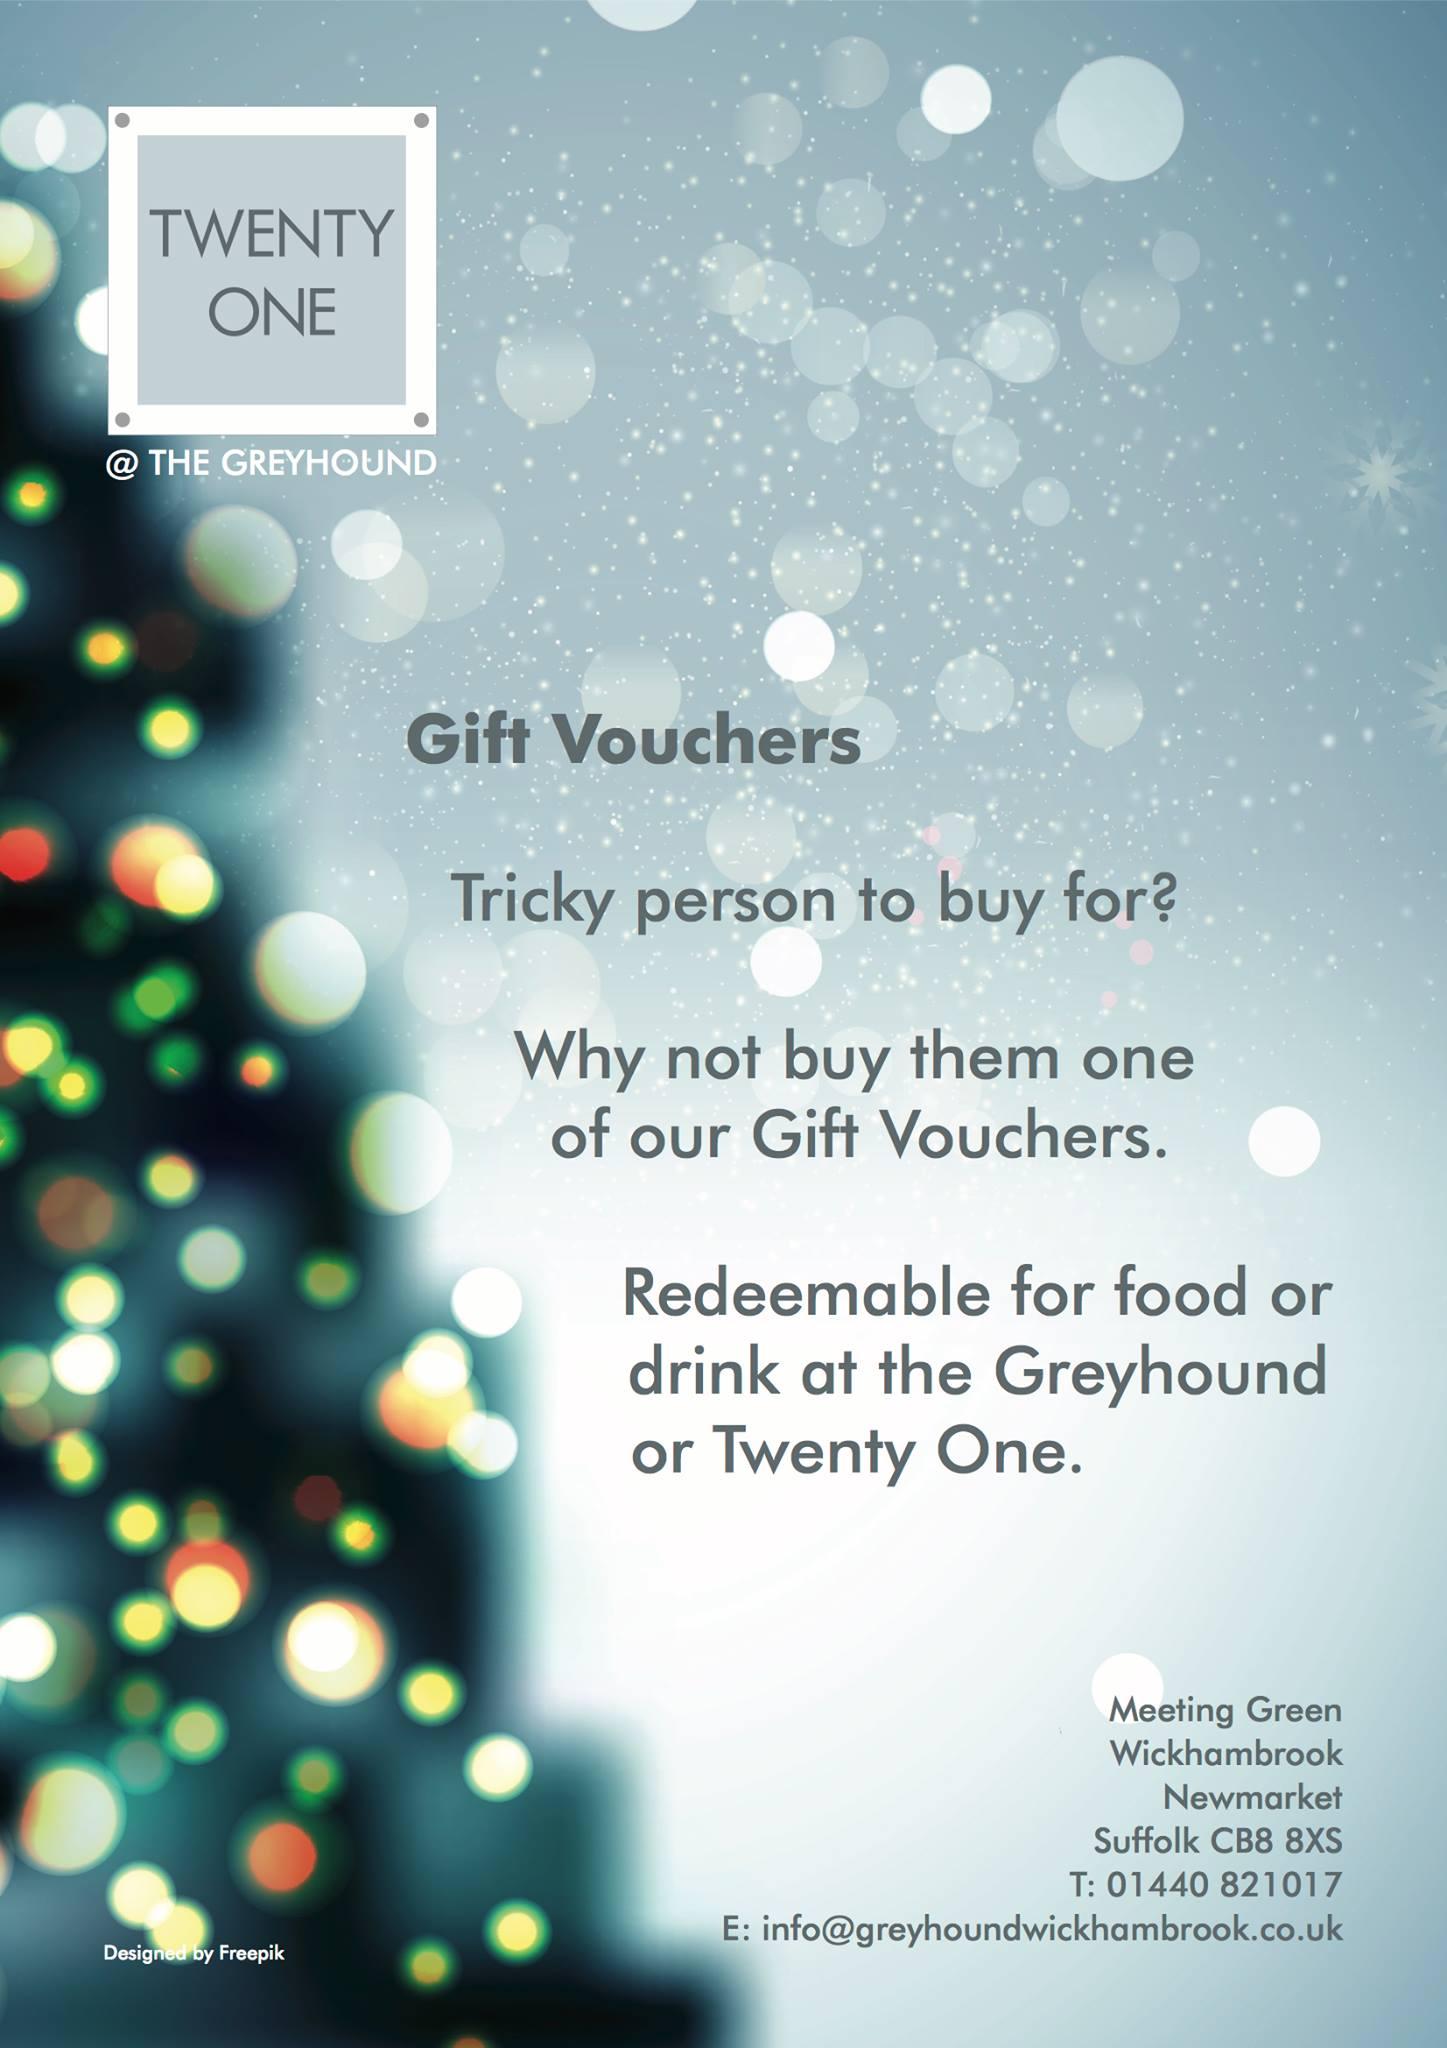 Greyhound Wickhambrook Gift Vouchers